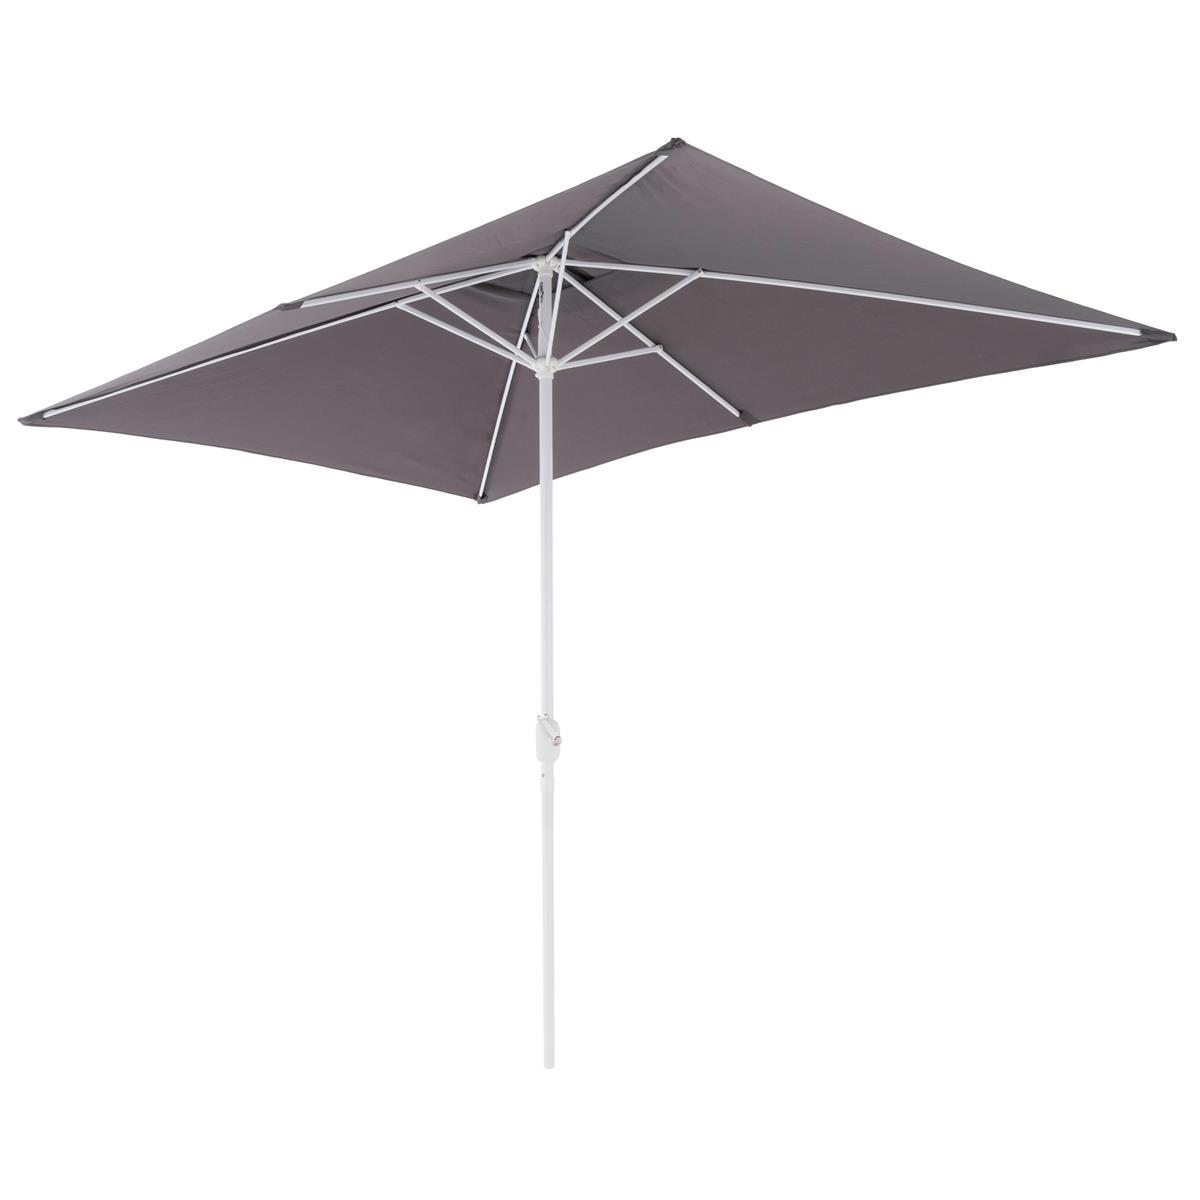 Sonnenschirm eckig 2x3m Anthrazit Kurbel Marktschirm Rechteckschirm Sonnenschutz